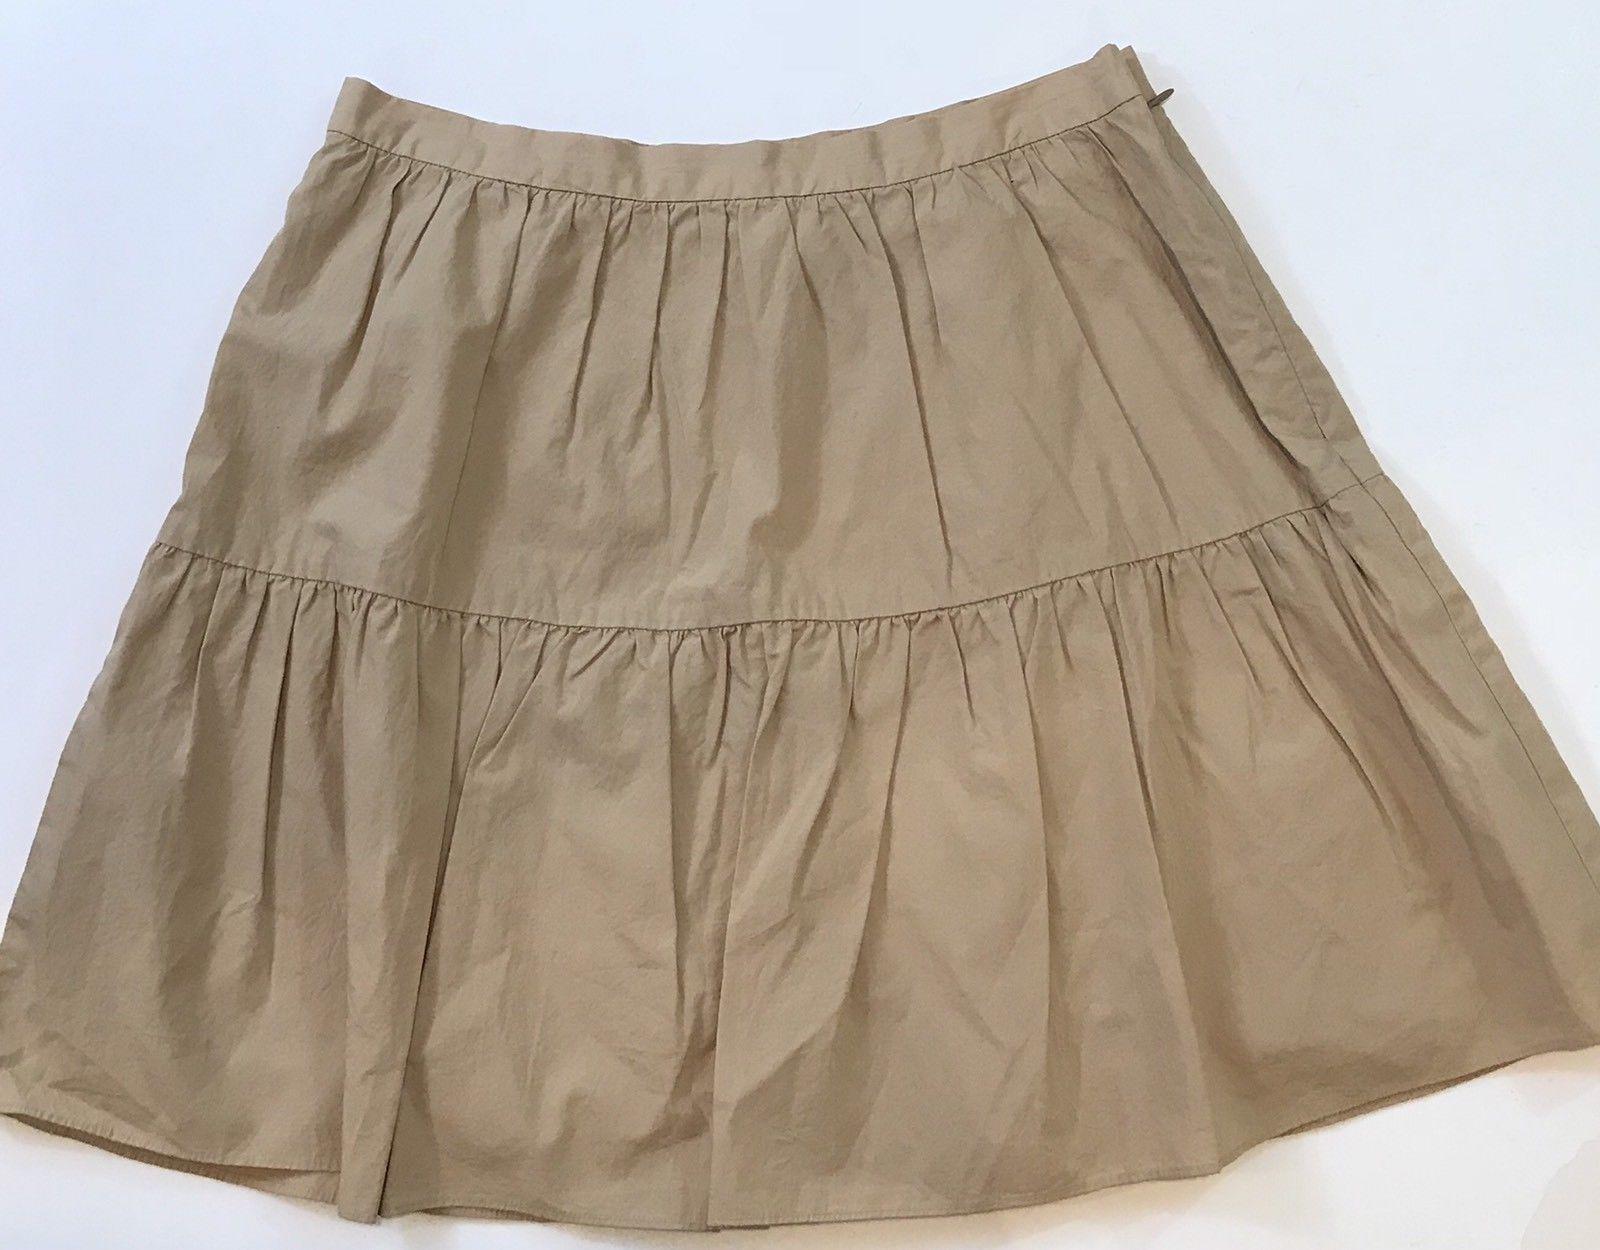 5193cc4c39 Madewell Brown Skirt Style G3460 Mini Skirt and 11 similar items